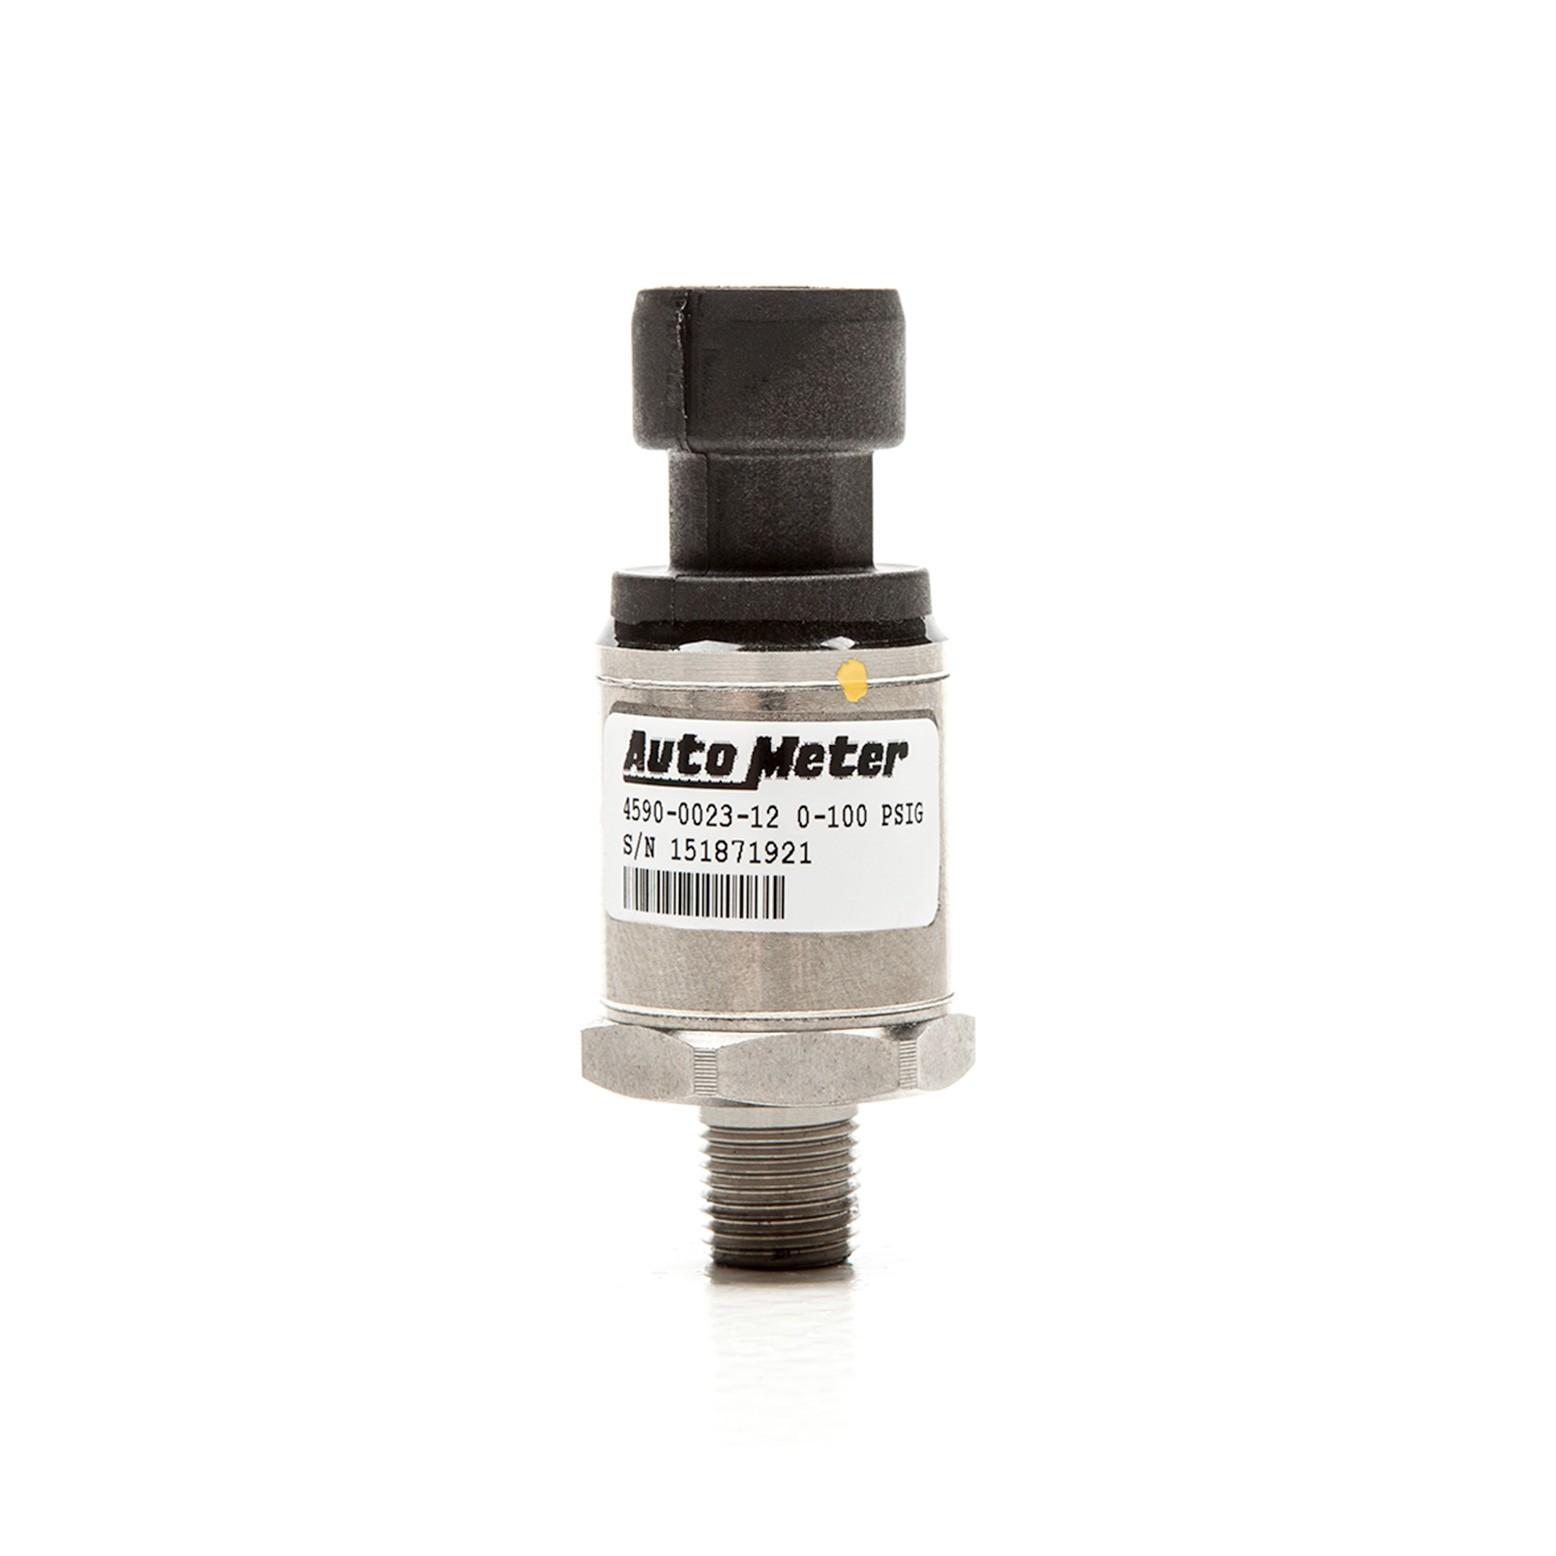 COBB Subaru Fuel Pressor Sensor Kit